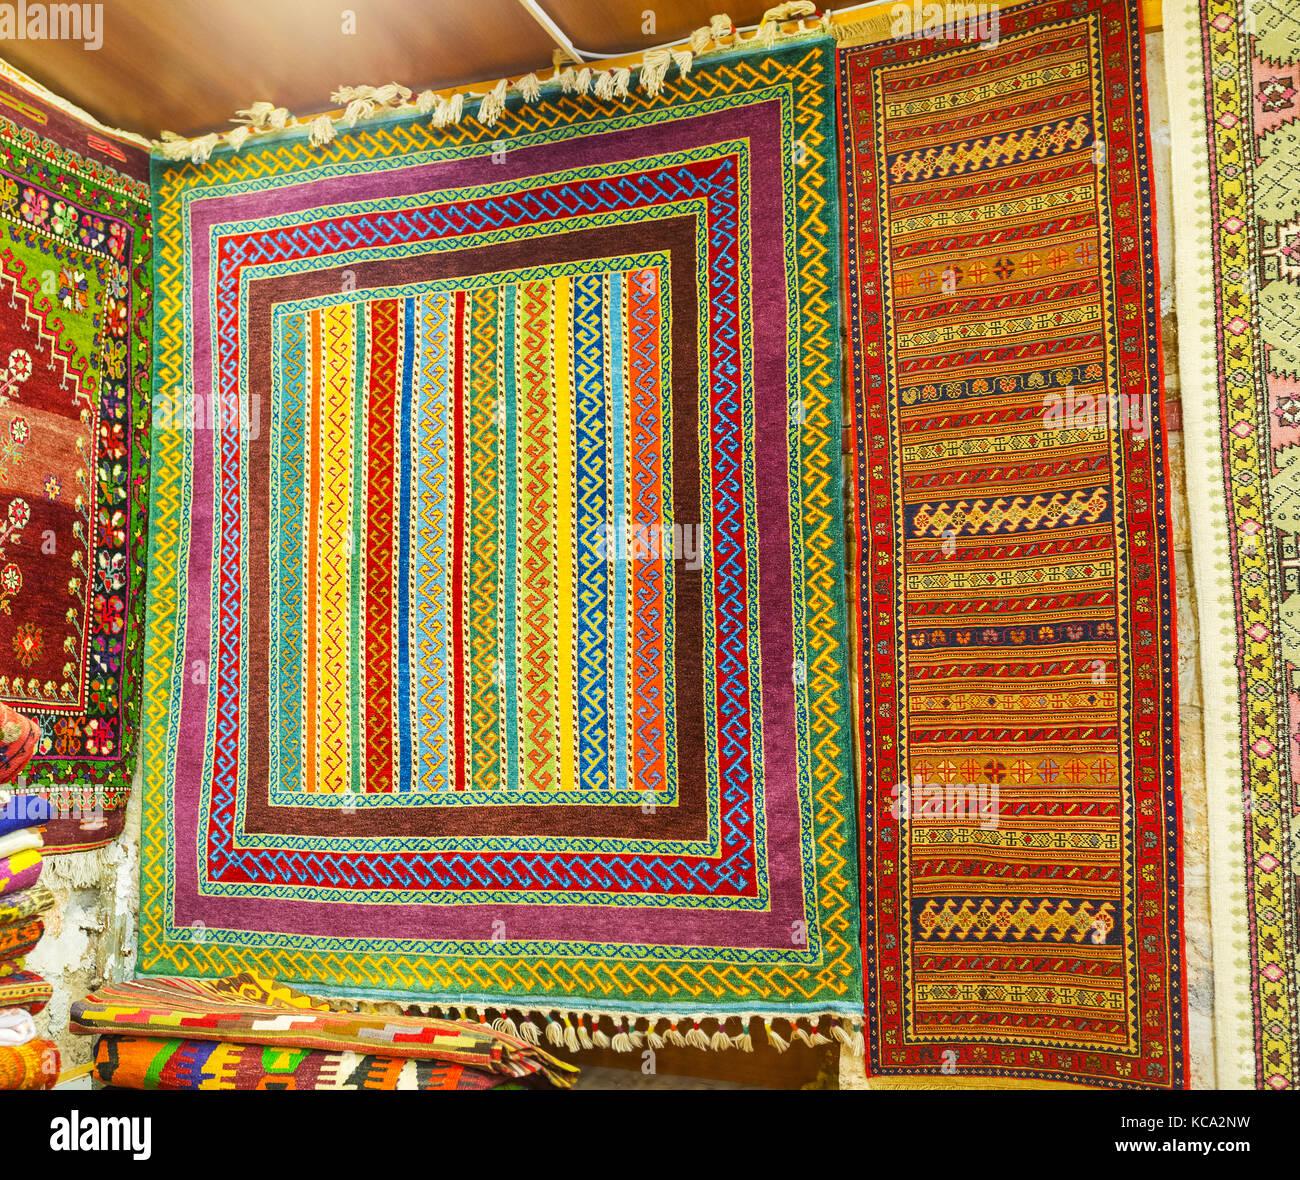 Kilim Carpet Stock Photos & Kilim Carpet Stock Images